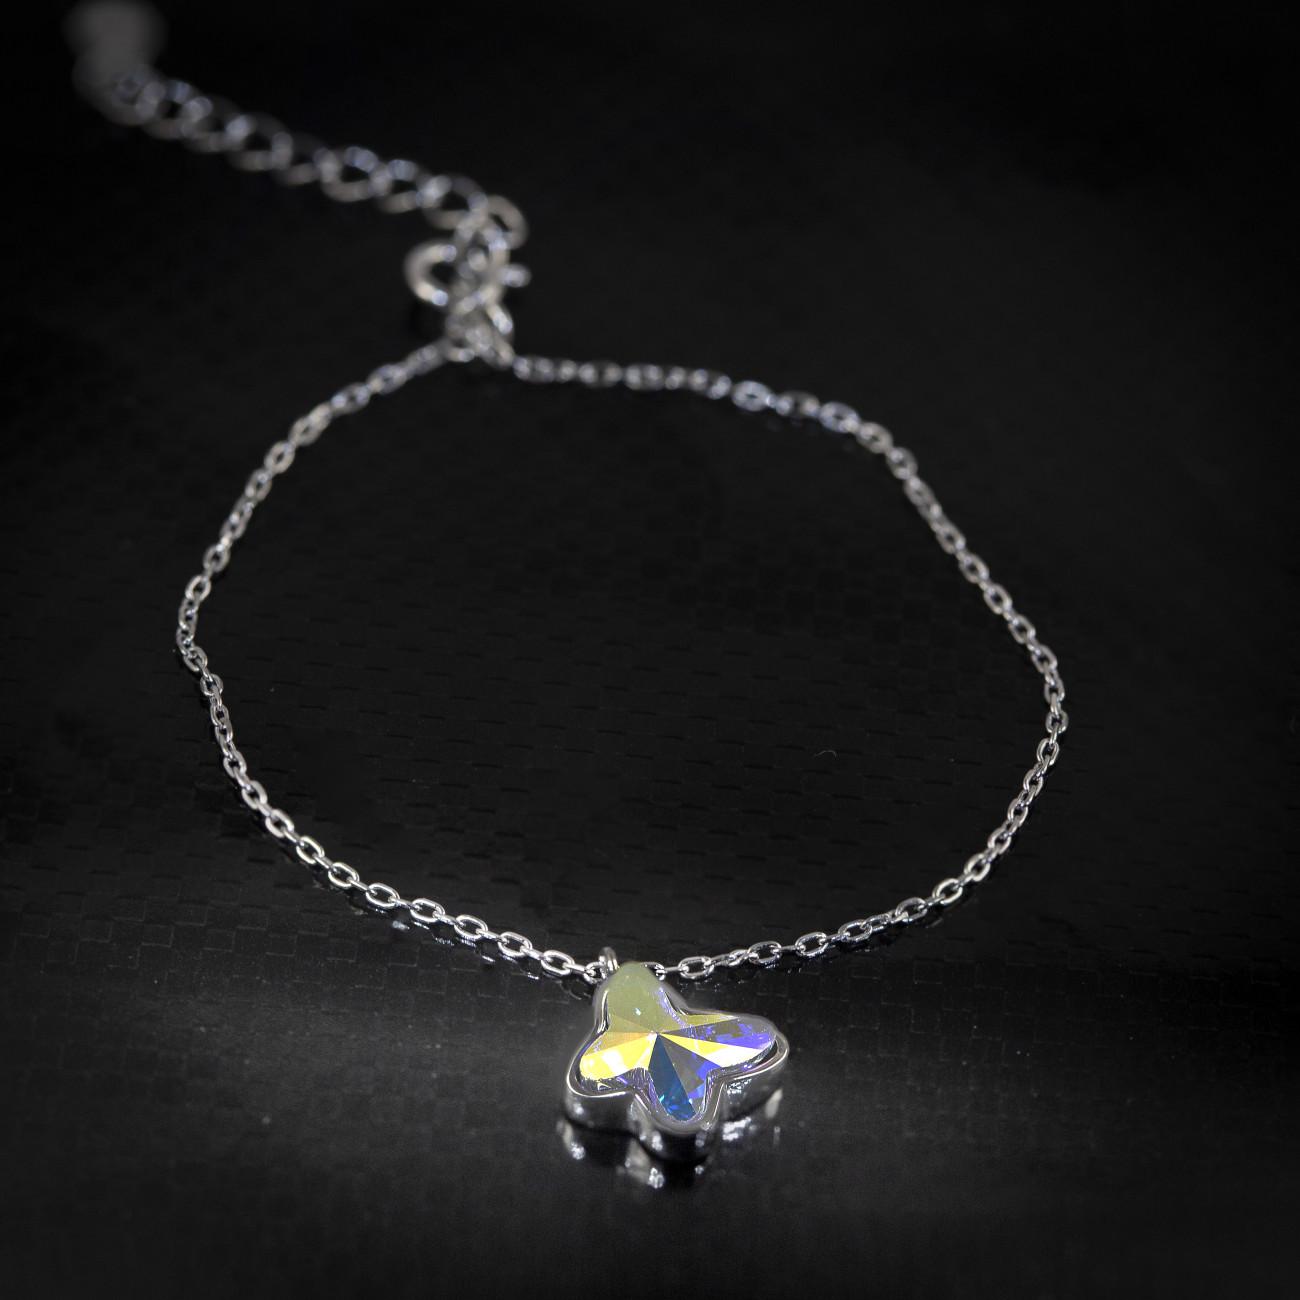 Stříbrný náramek Savour s pravým krystalem Swarovski - aurore butterfly